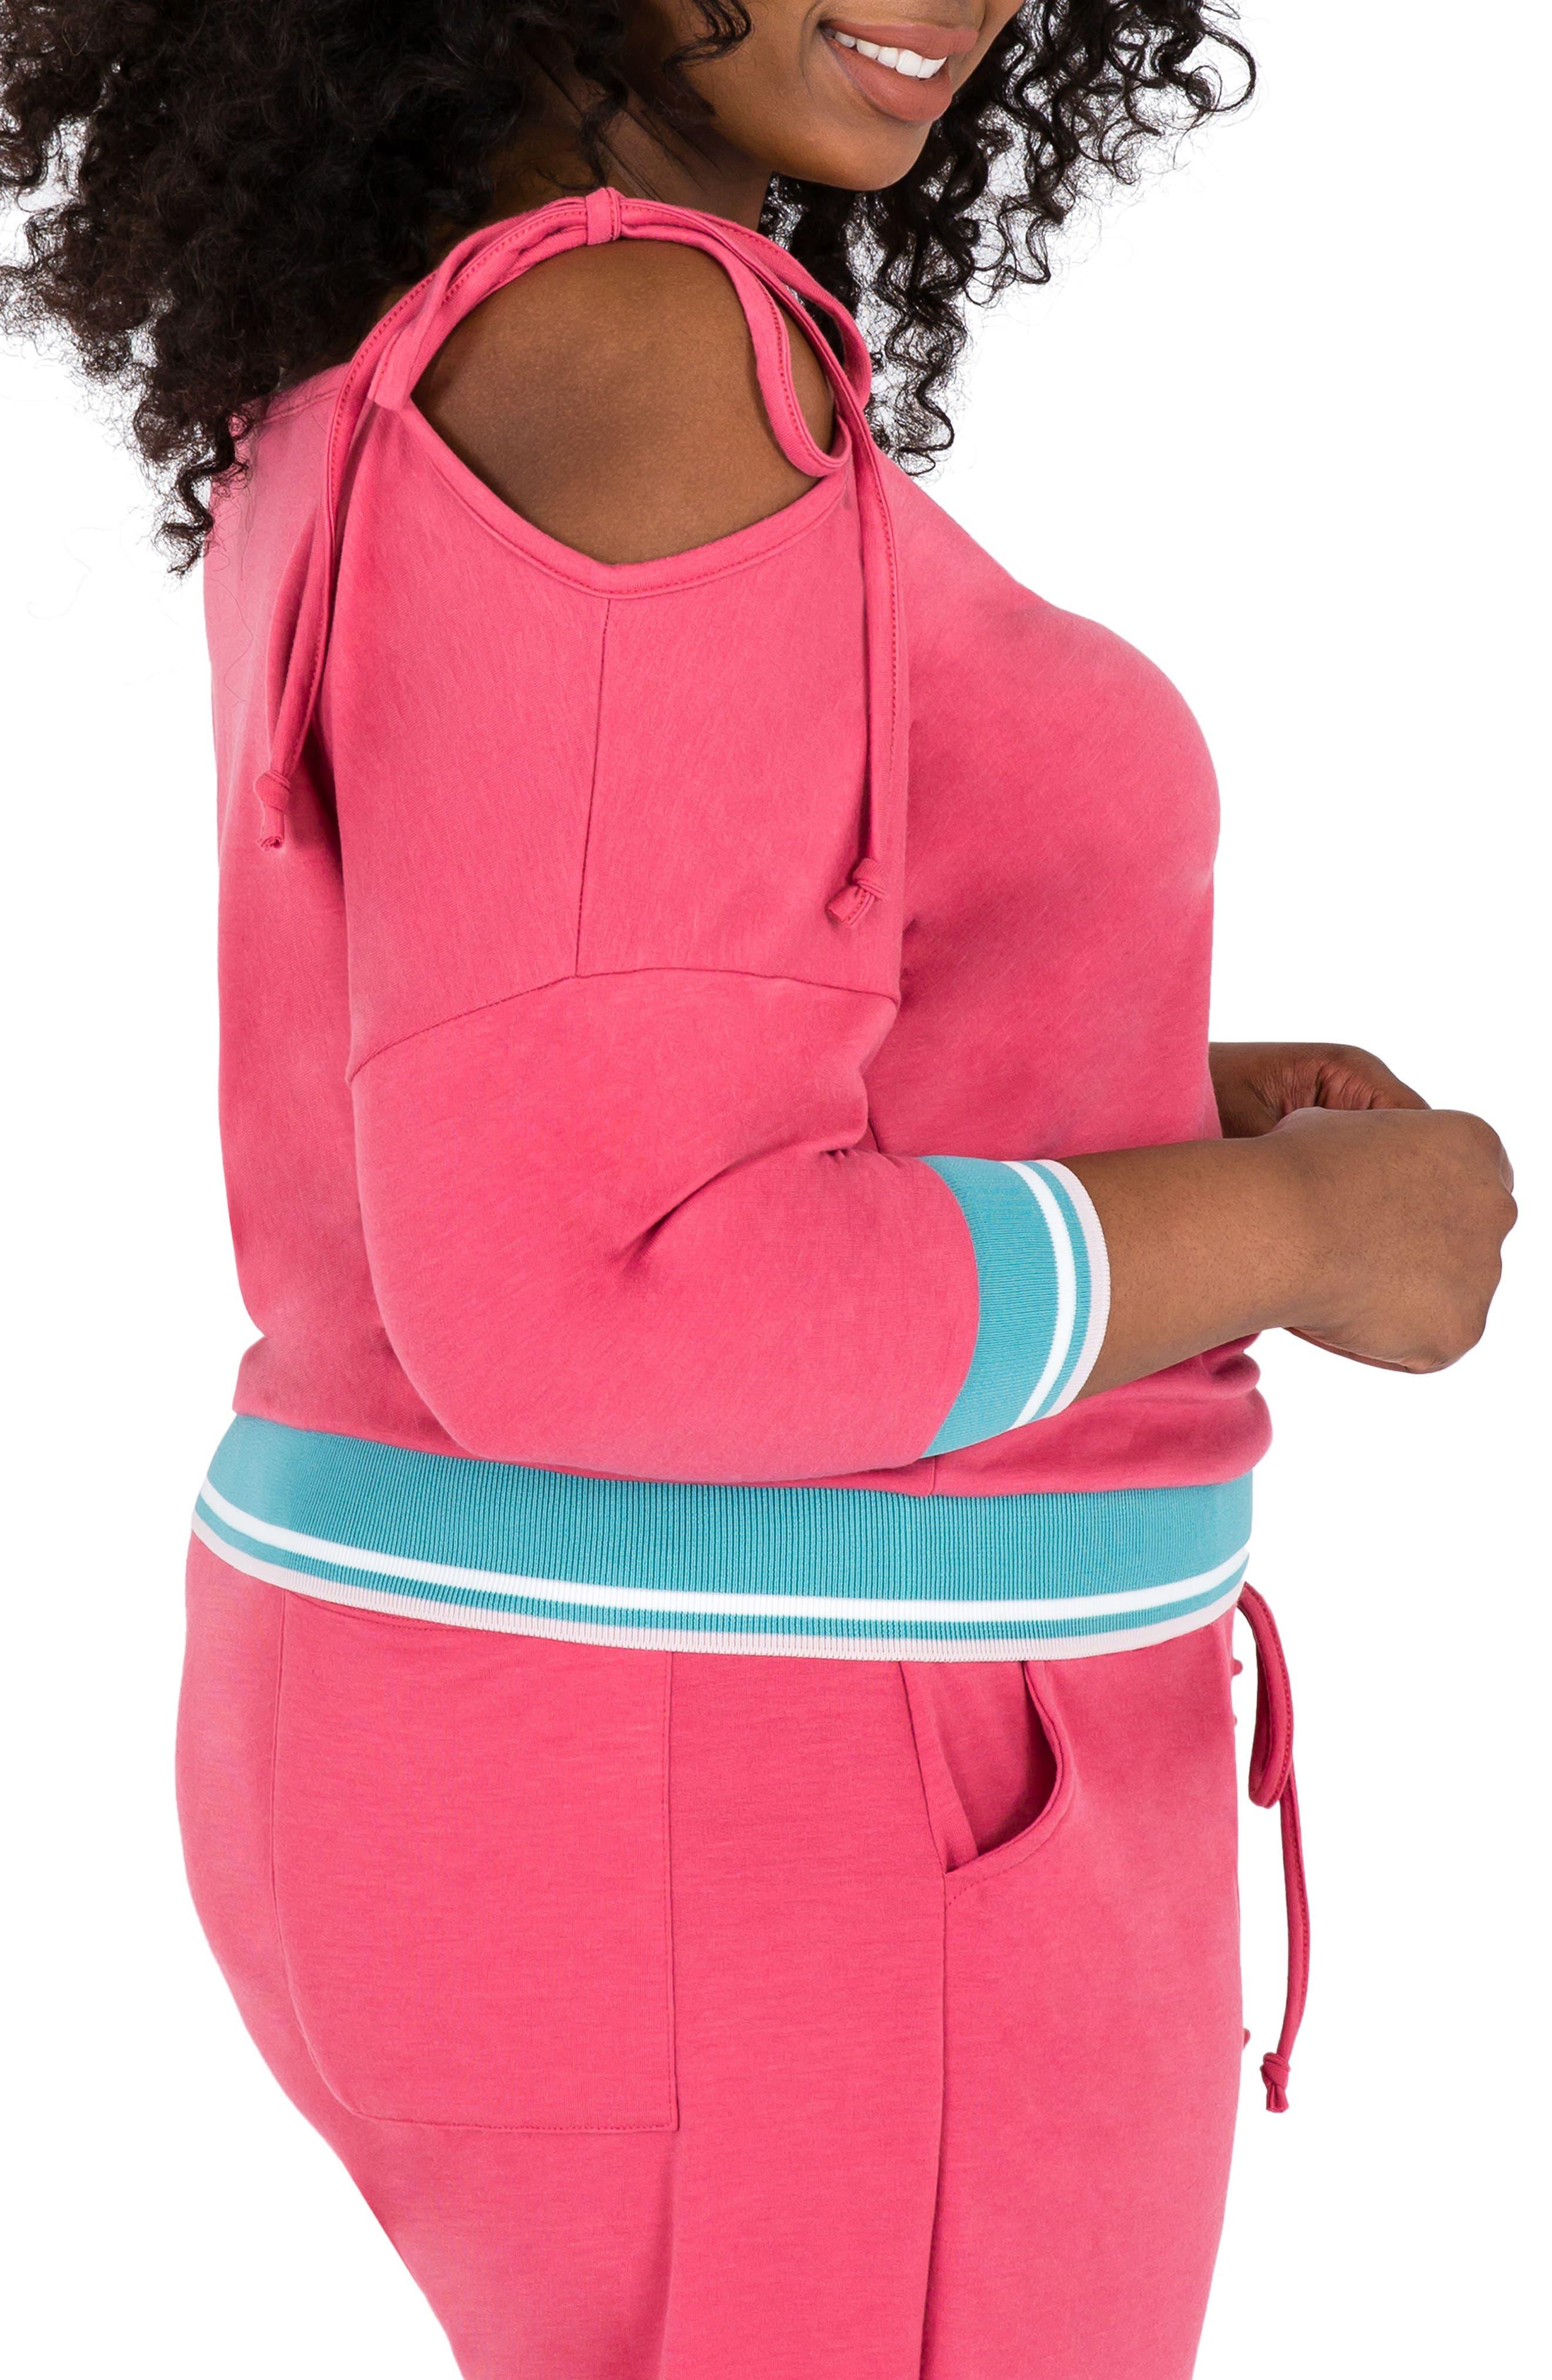 Janae Convertible Knit Top,                             Alternate thumbnail 3, color,                             Deep Rose Pink